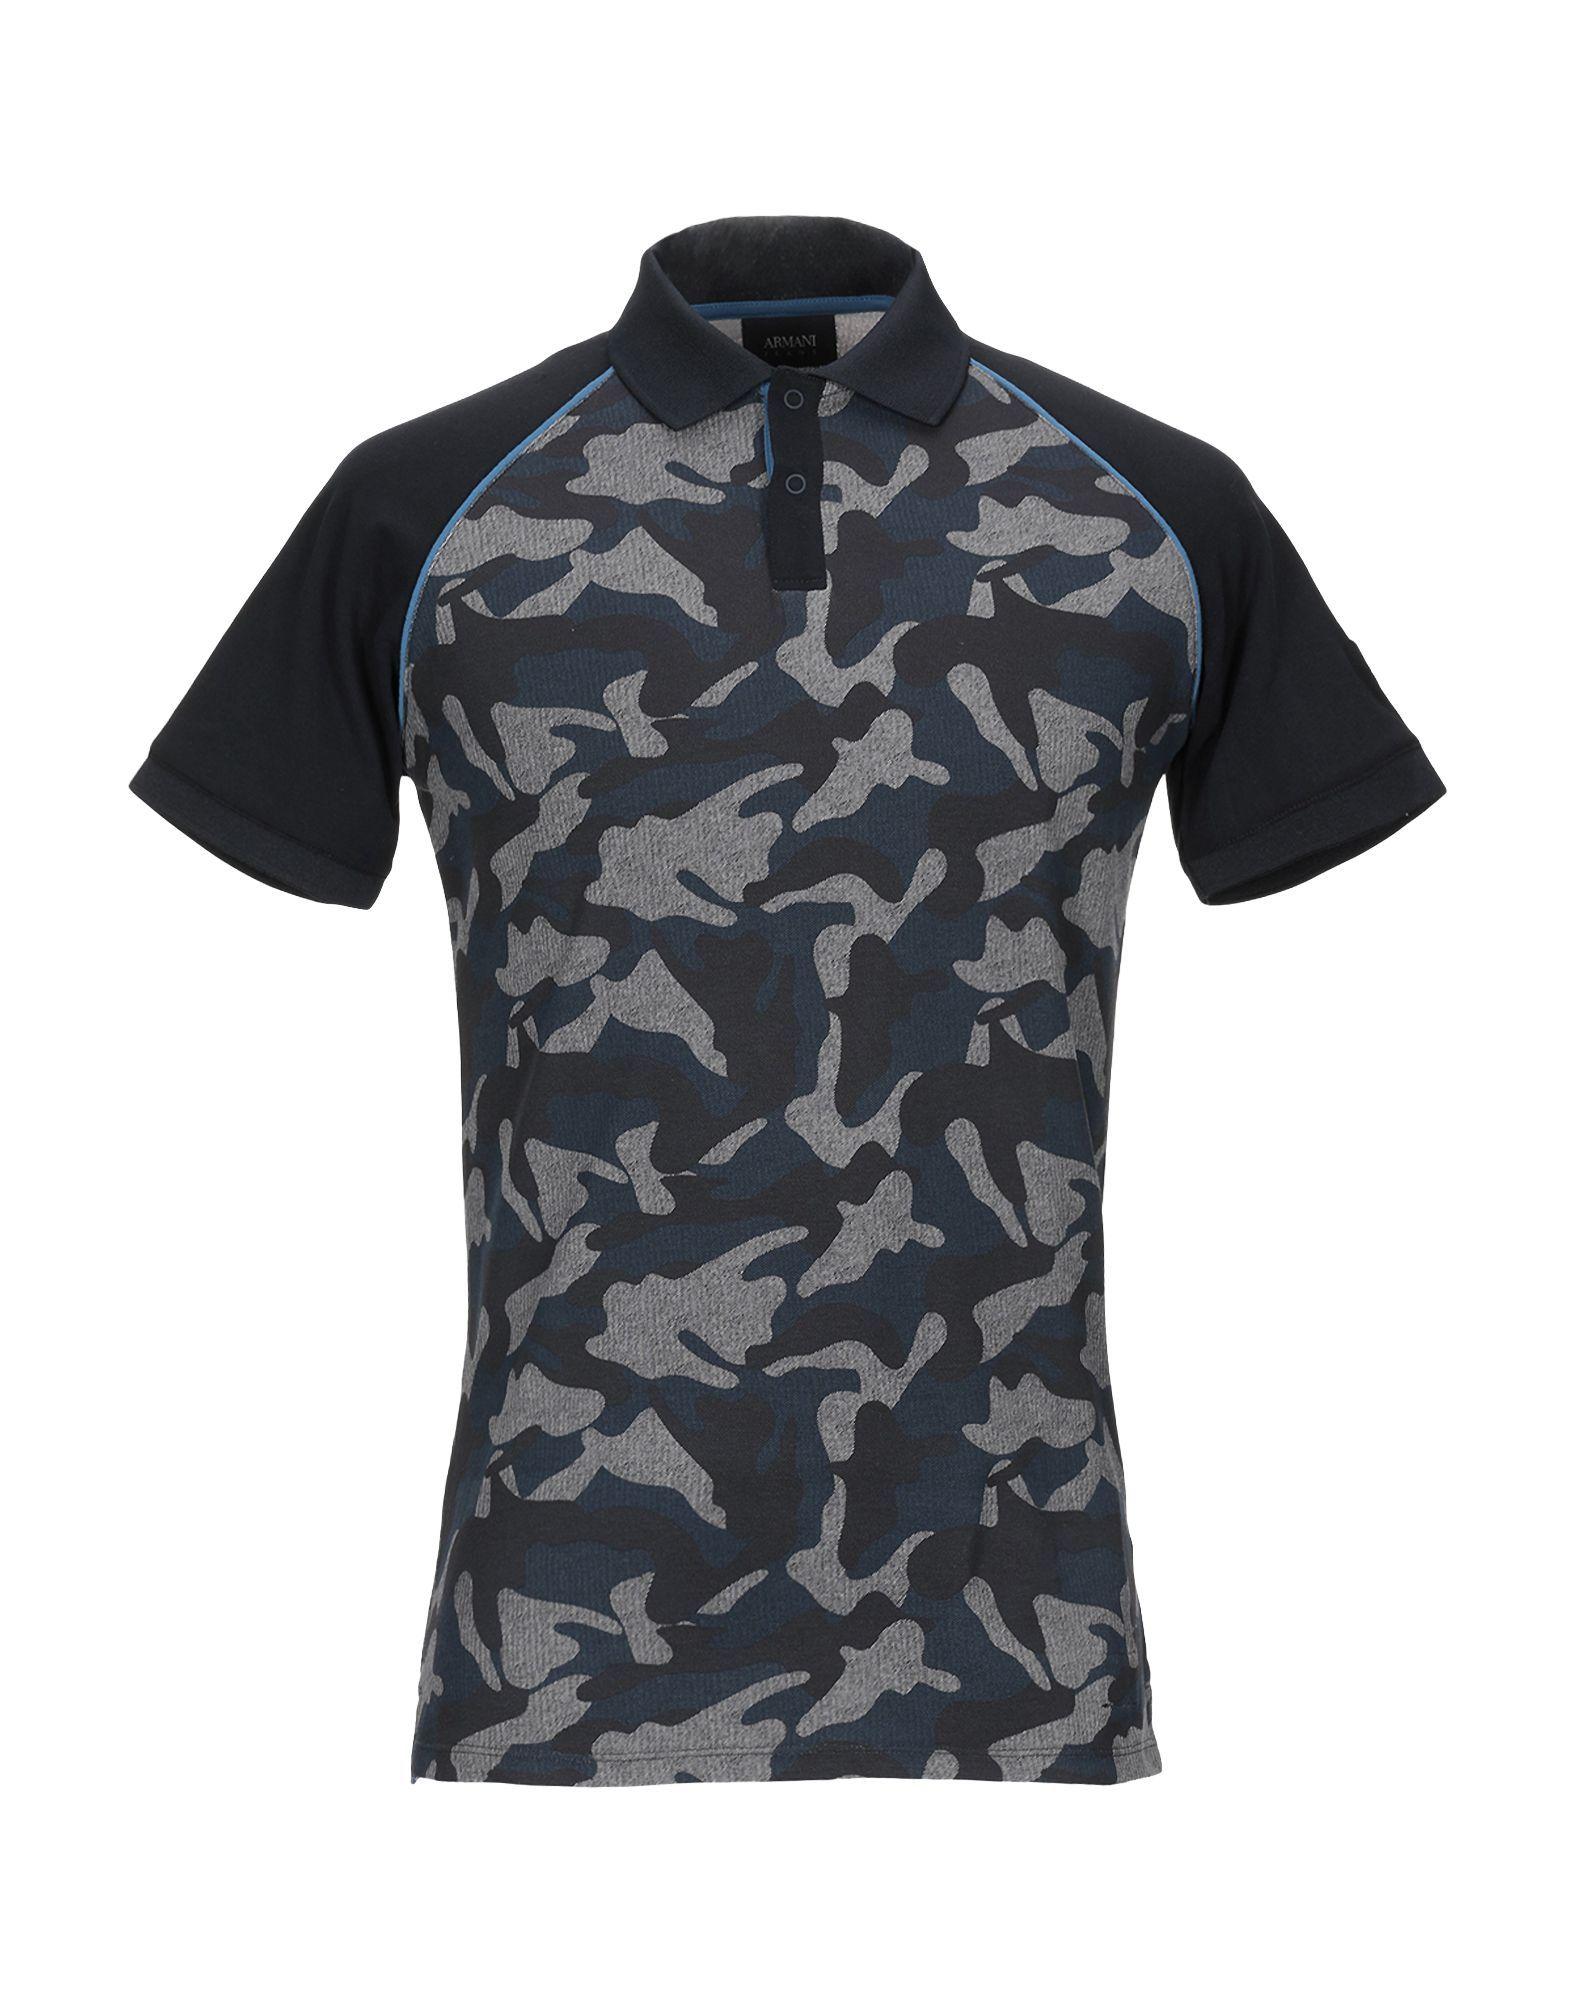 65be0e3e Armani Jeans Mens Polo Shirt